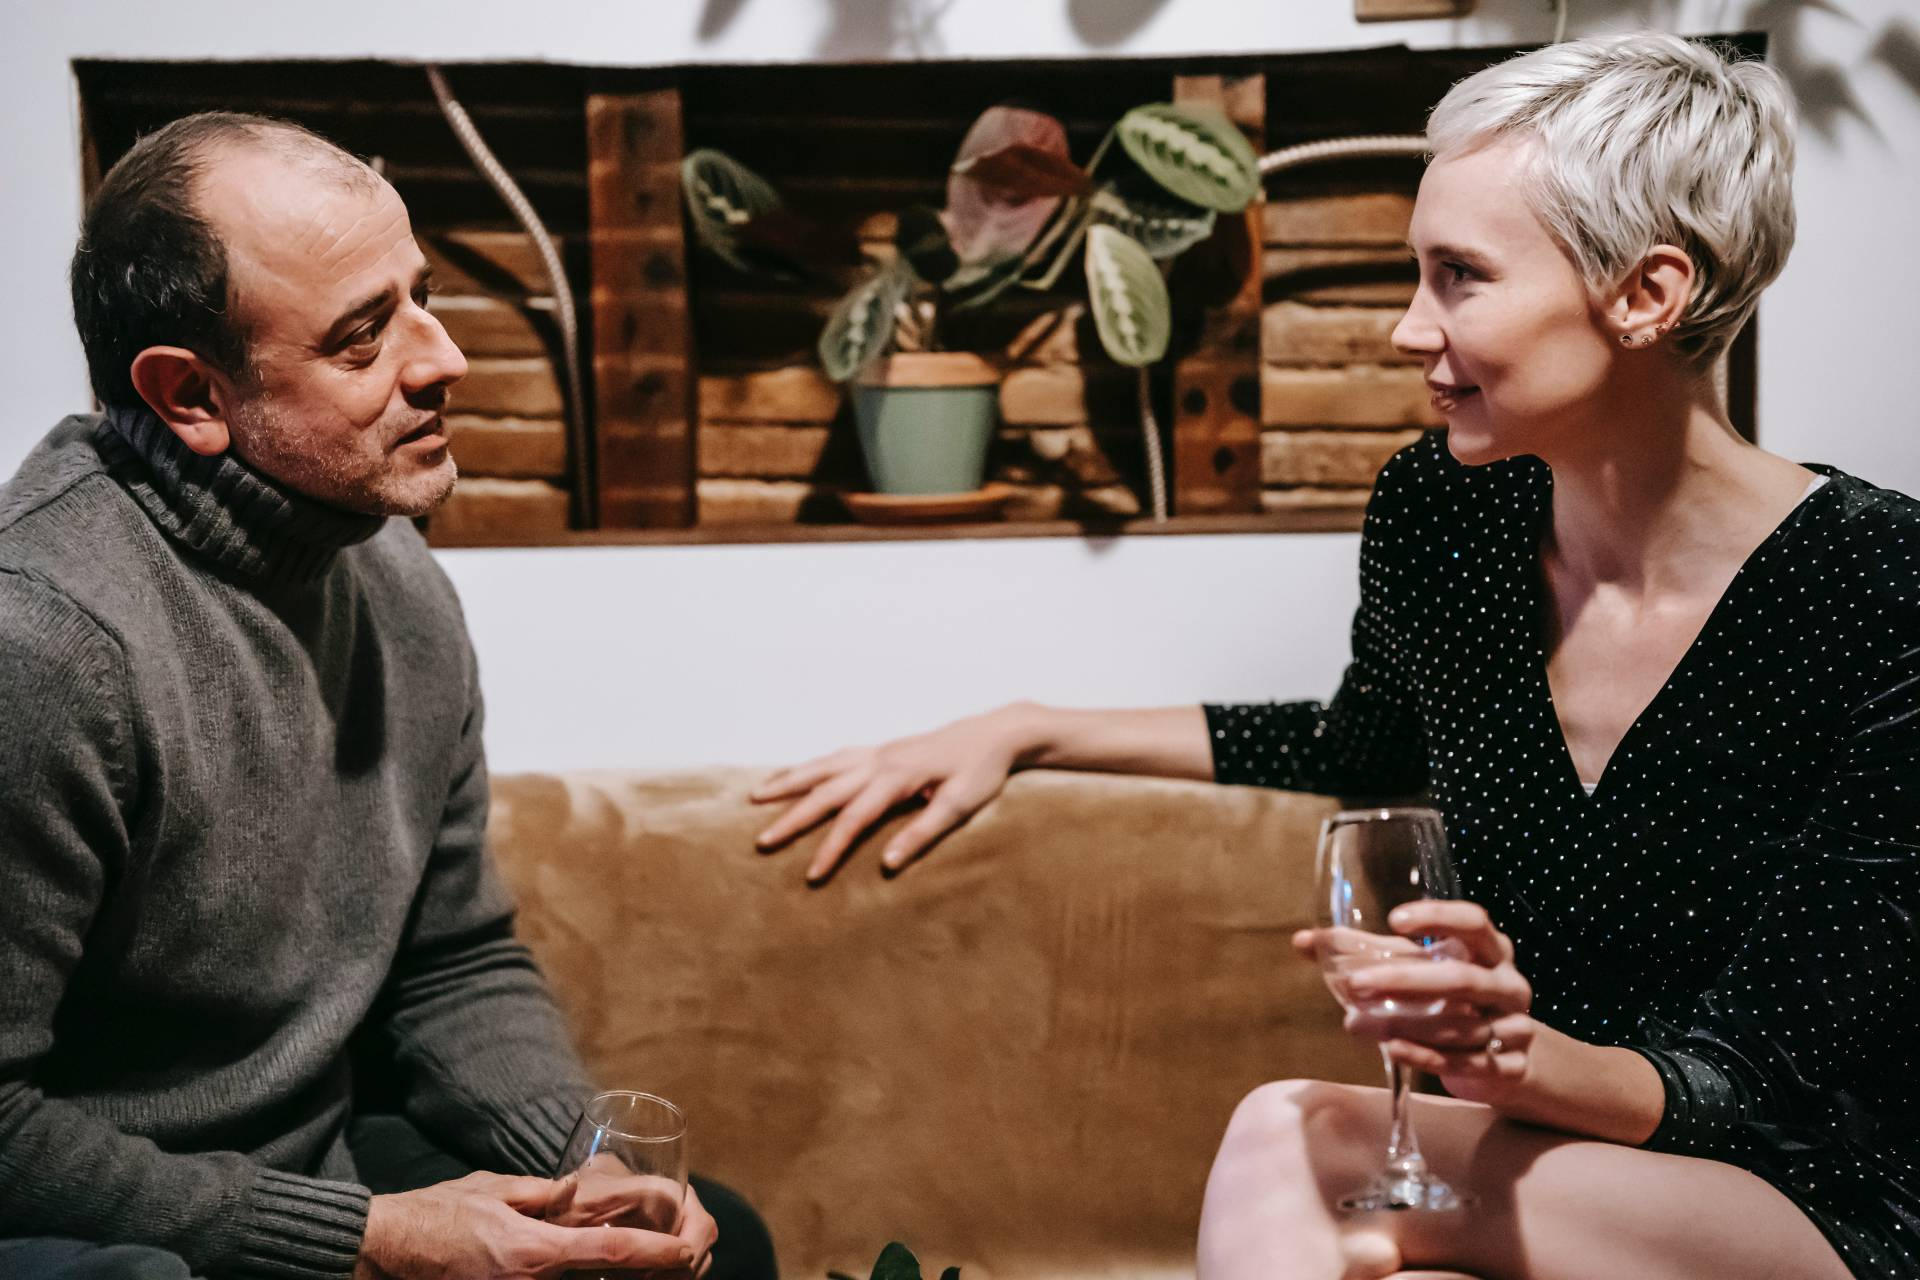 LS Couple Communicating